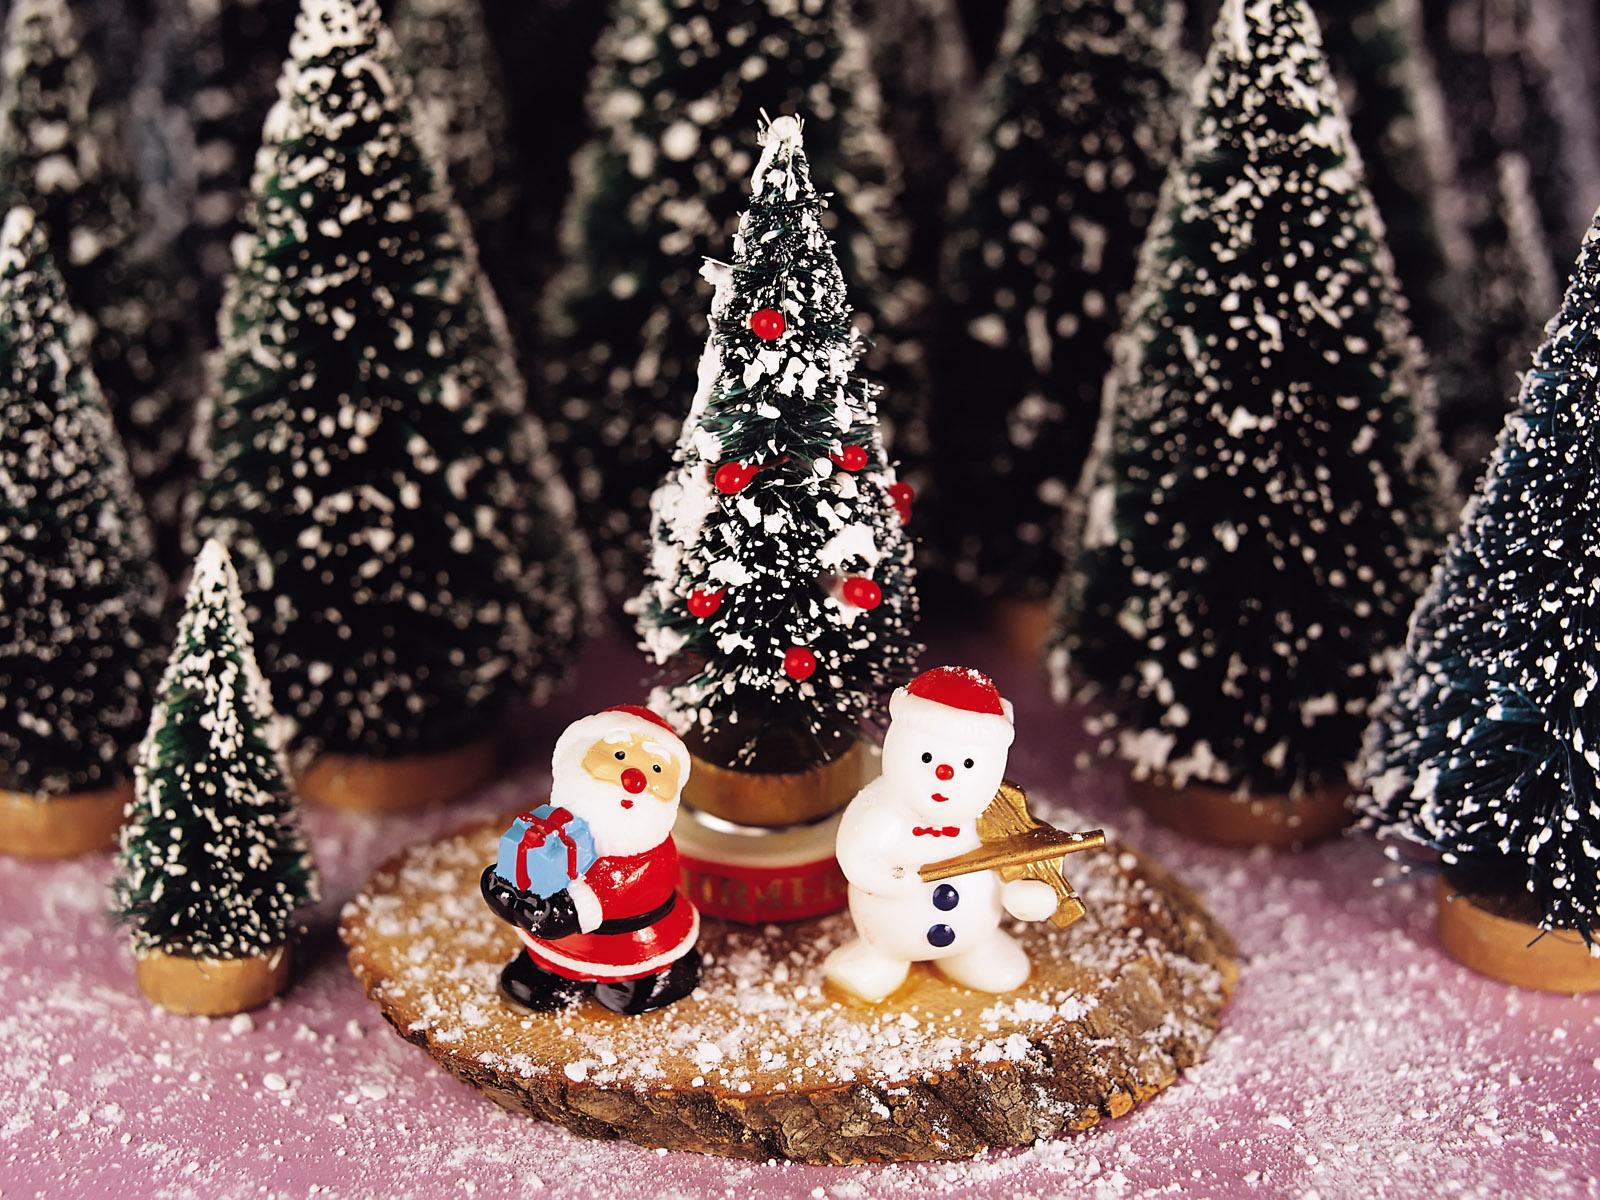 http://1.bp.blogspot.com/-M4O4K7XUEX8/TvXIPPM1VsI/AAAAAAAADWs/daUyf-Dk5U8/s1600/Christmas+Wallpapers+in+High+Definition+%25283%2529.jpg